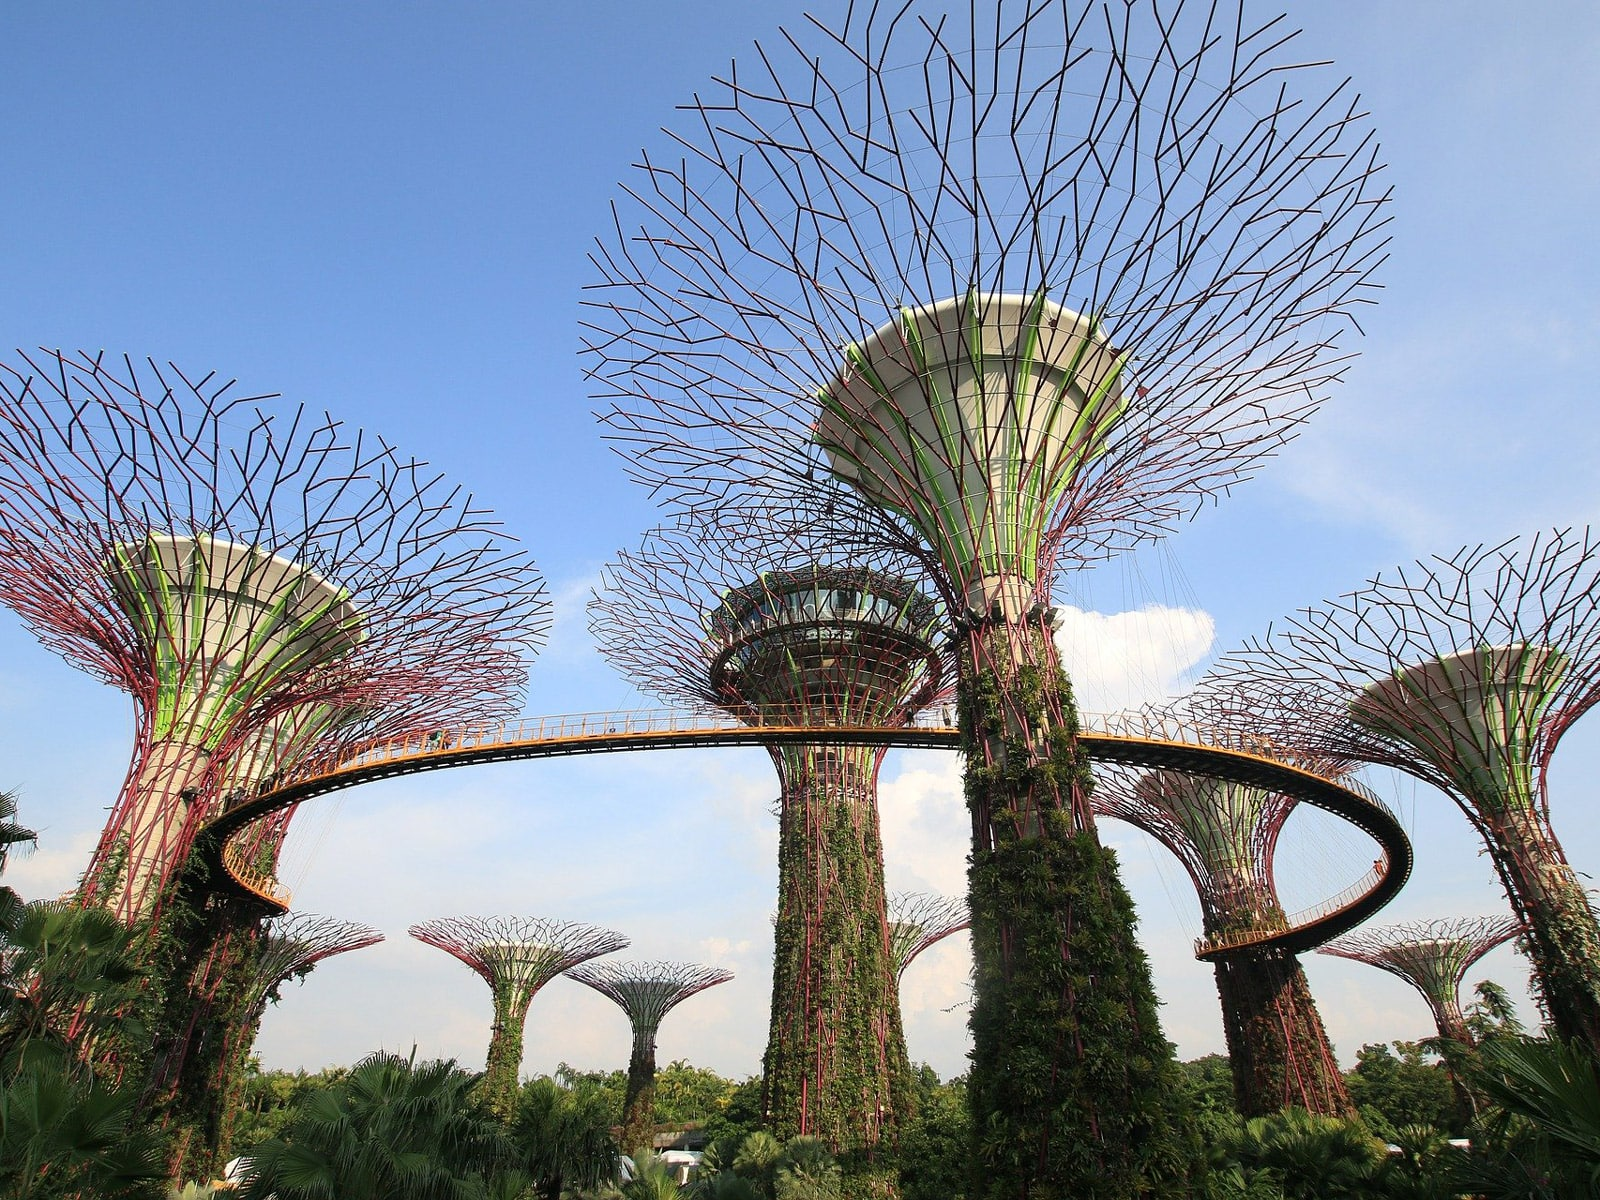 rondreis singapore blog stop ovr 3